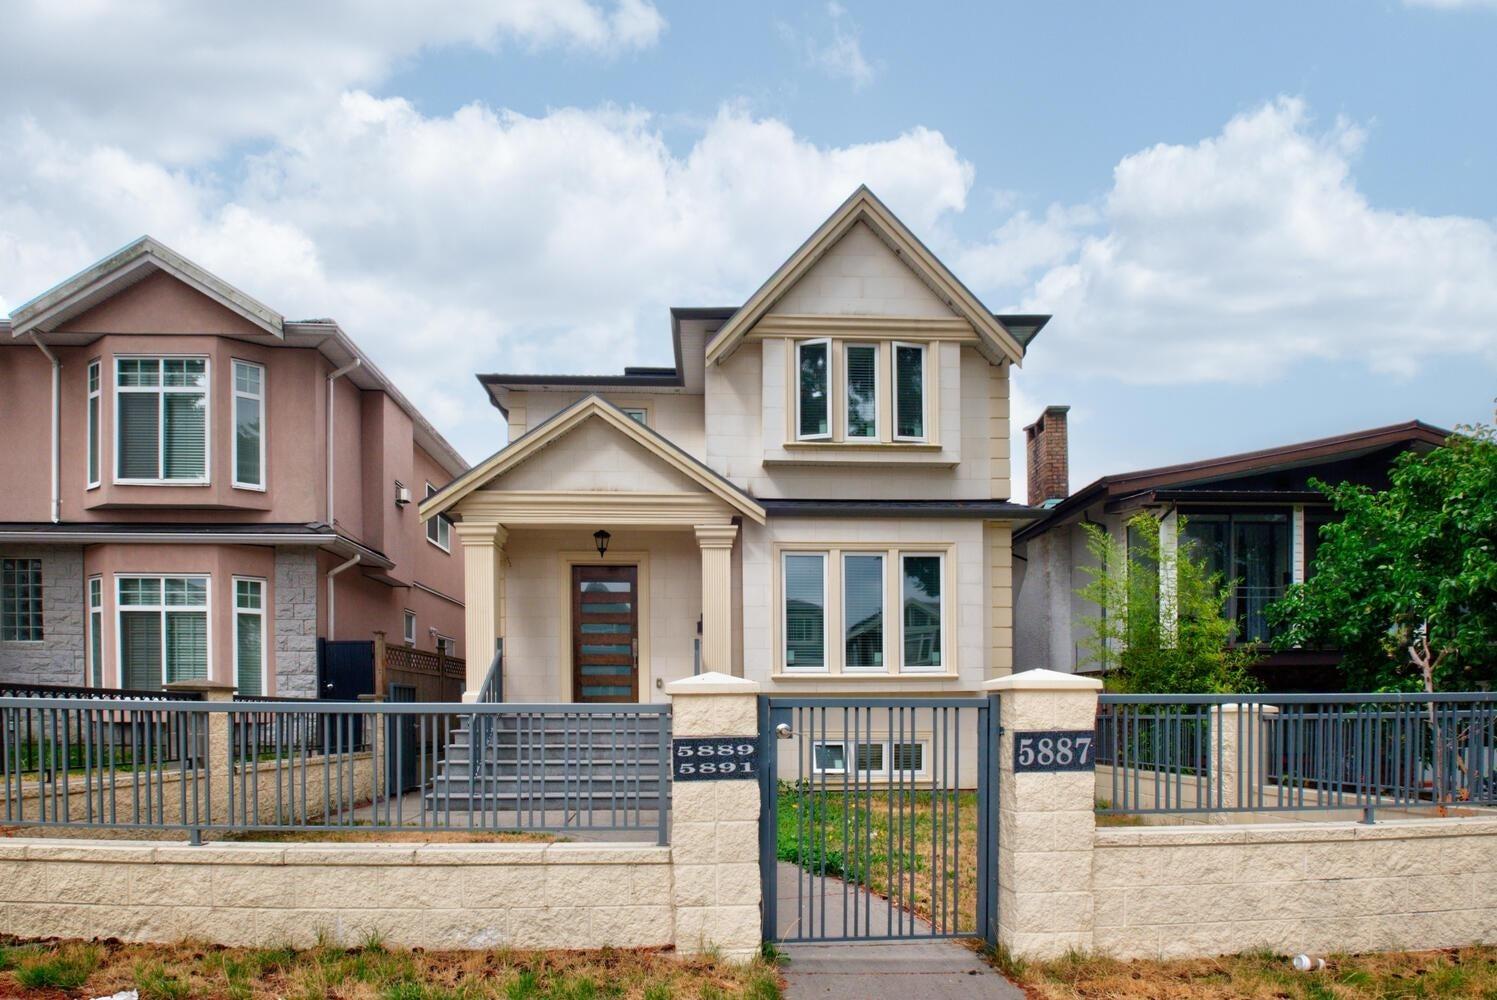 5887 BATTISON STREET - Killarney VE House/Single Family for sale, 10 Bedrooms (R2611336) - #1